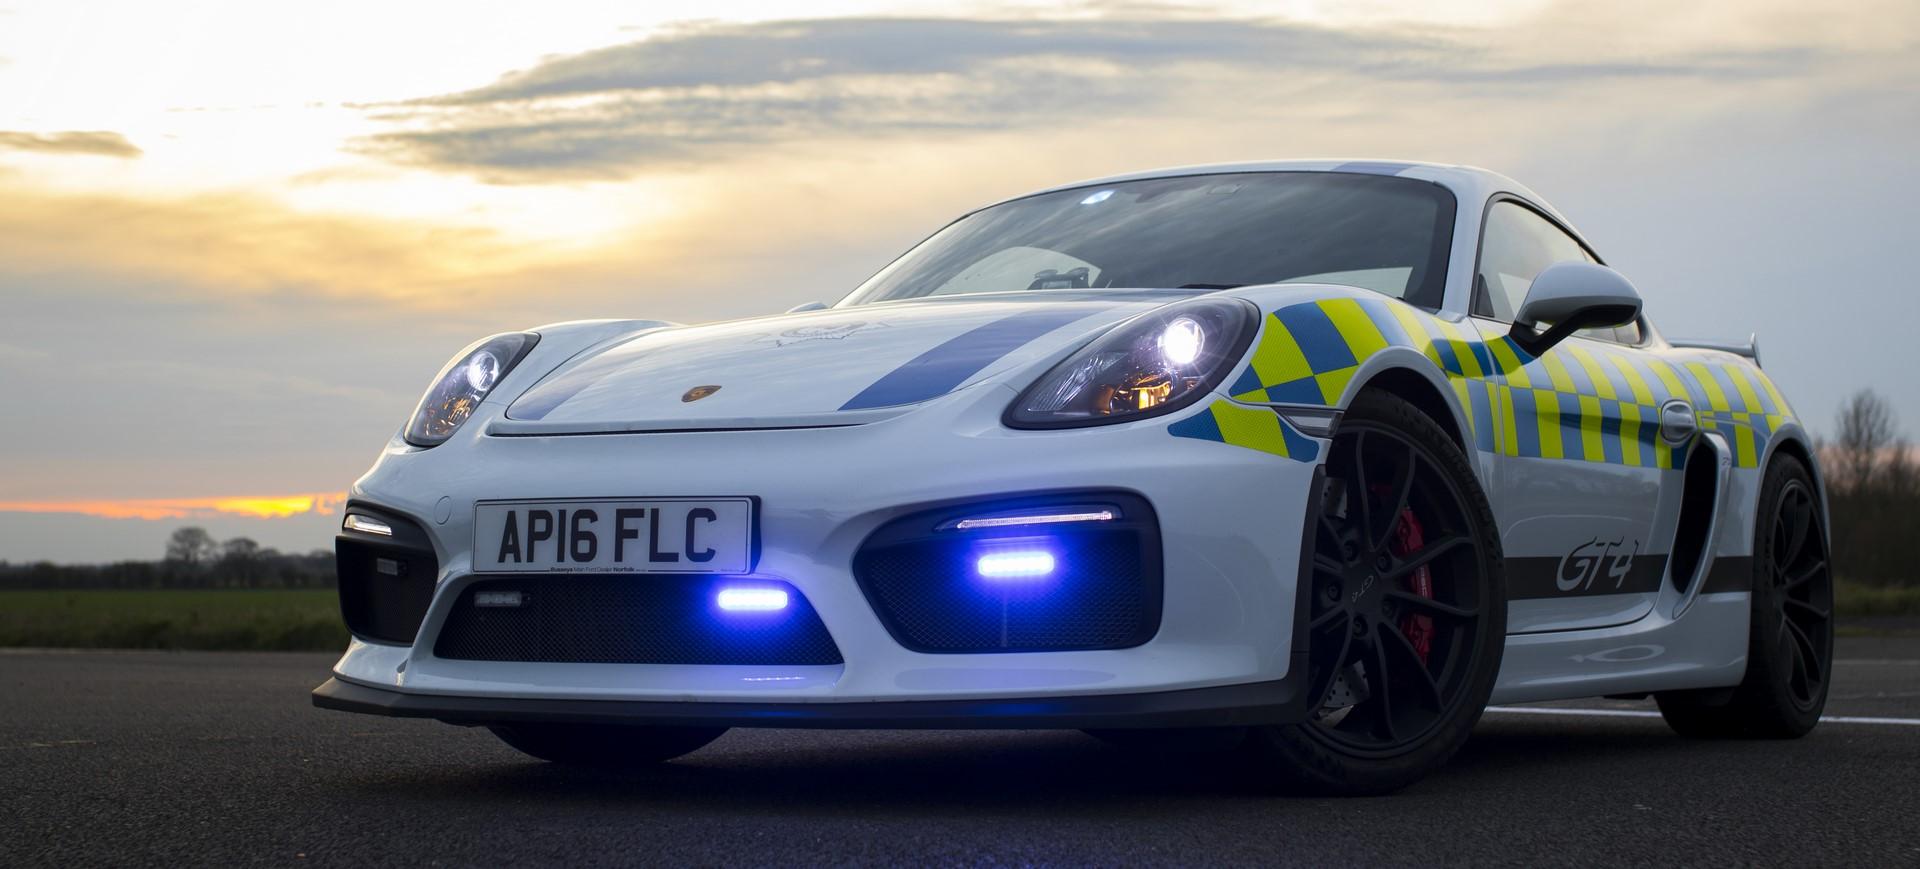 Porsche Cayman GT4 police car (1)